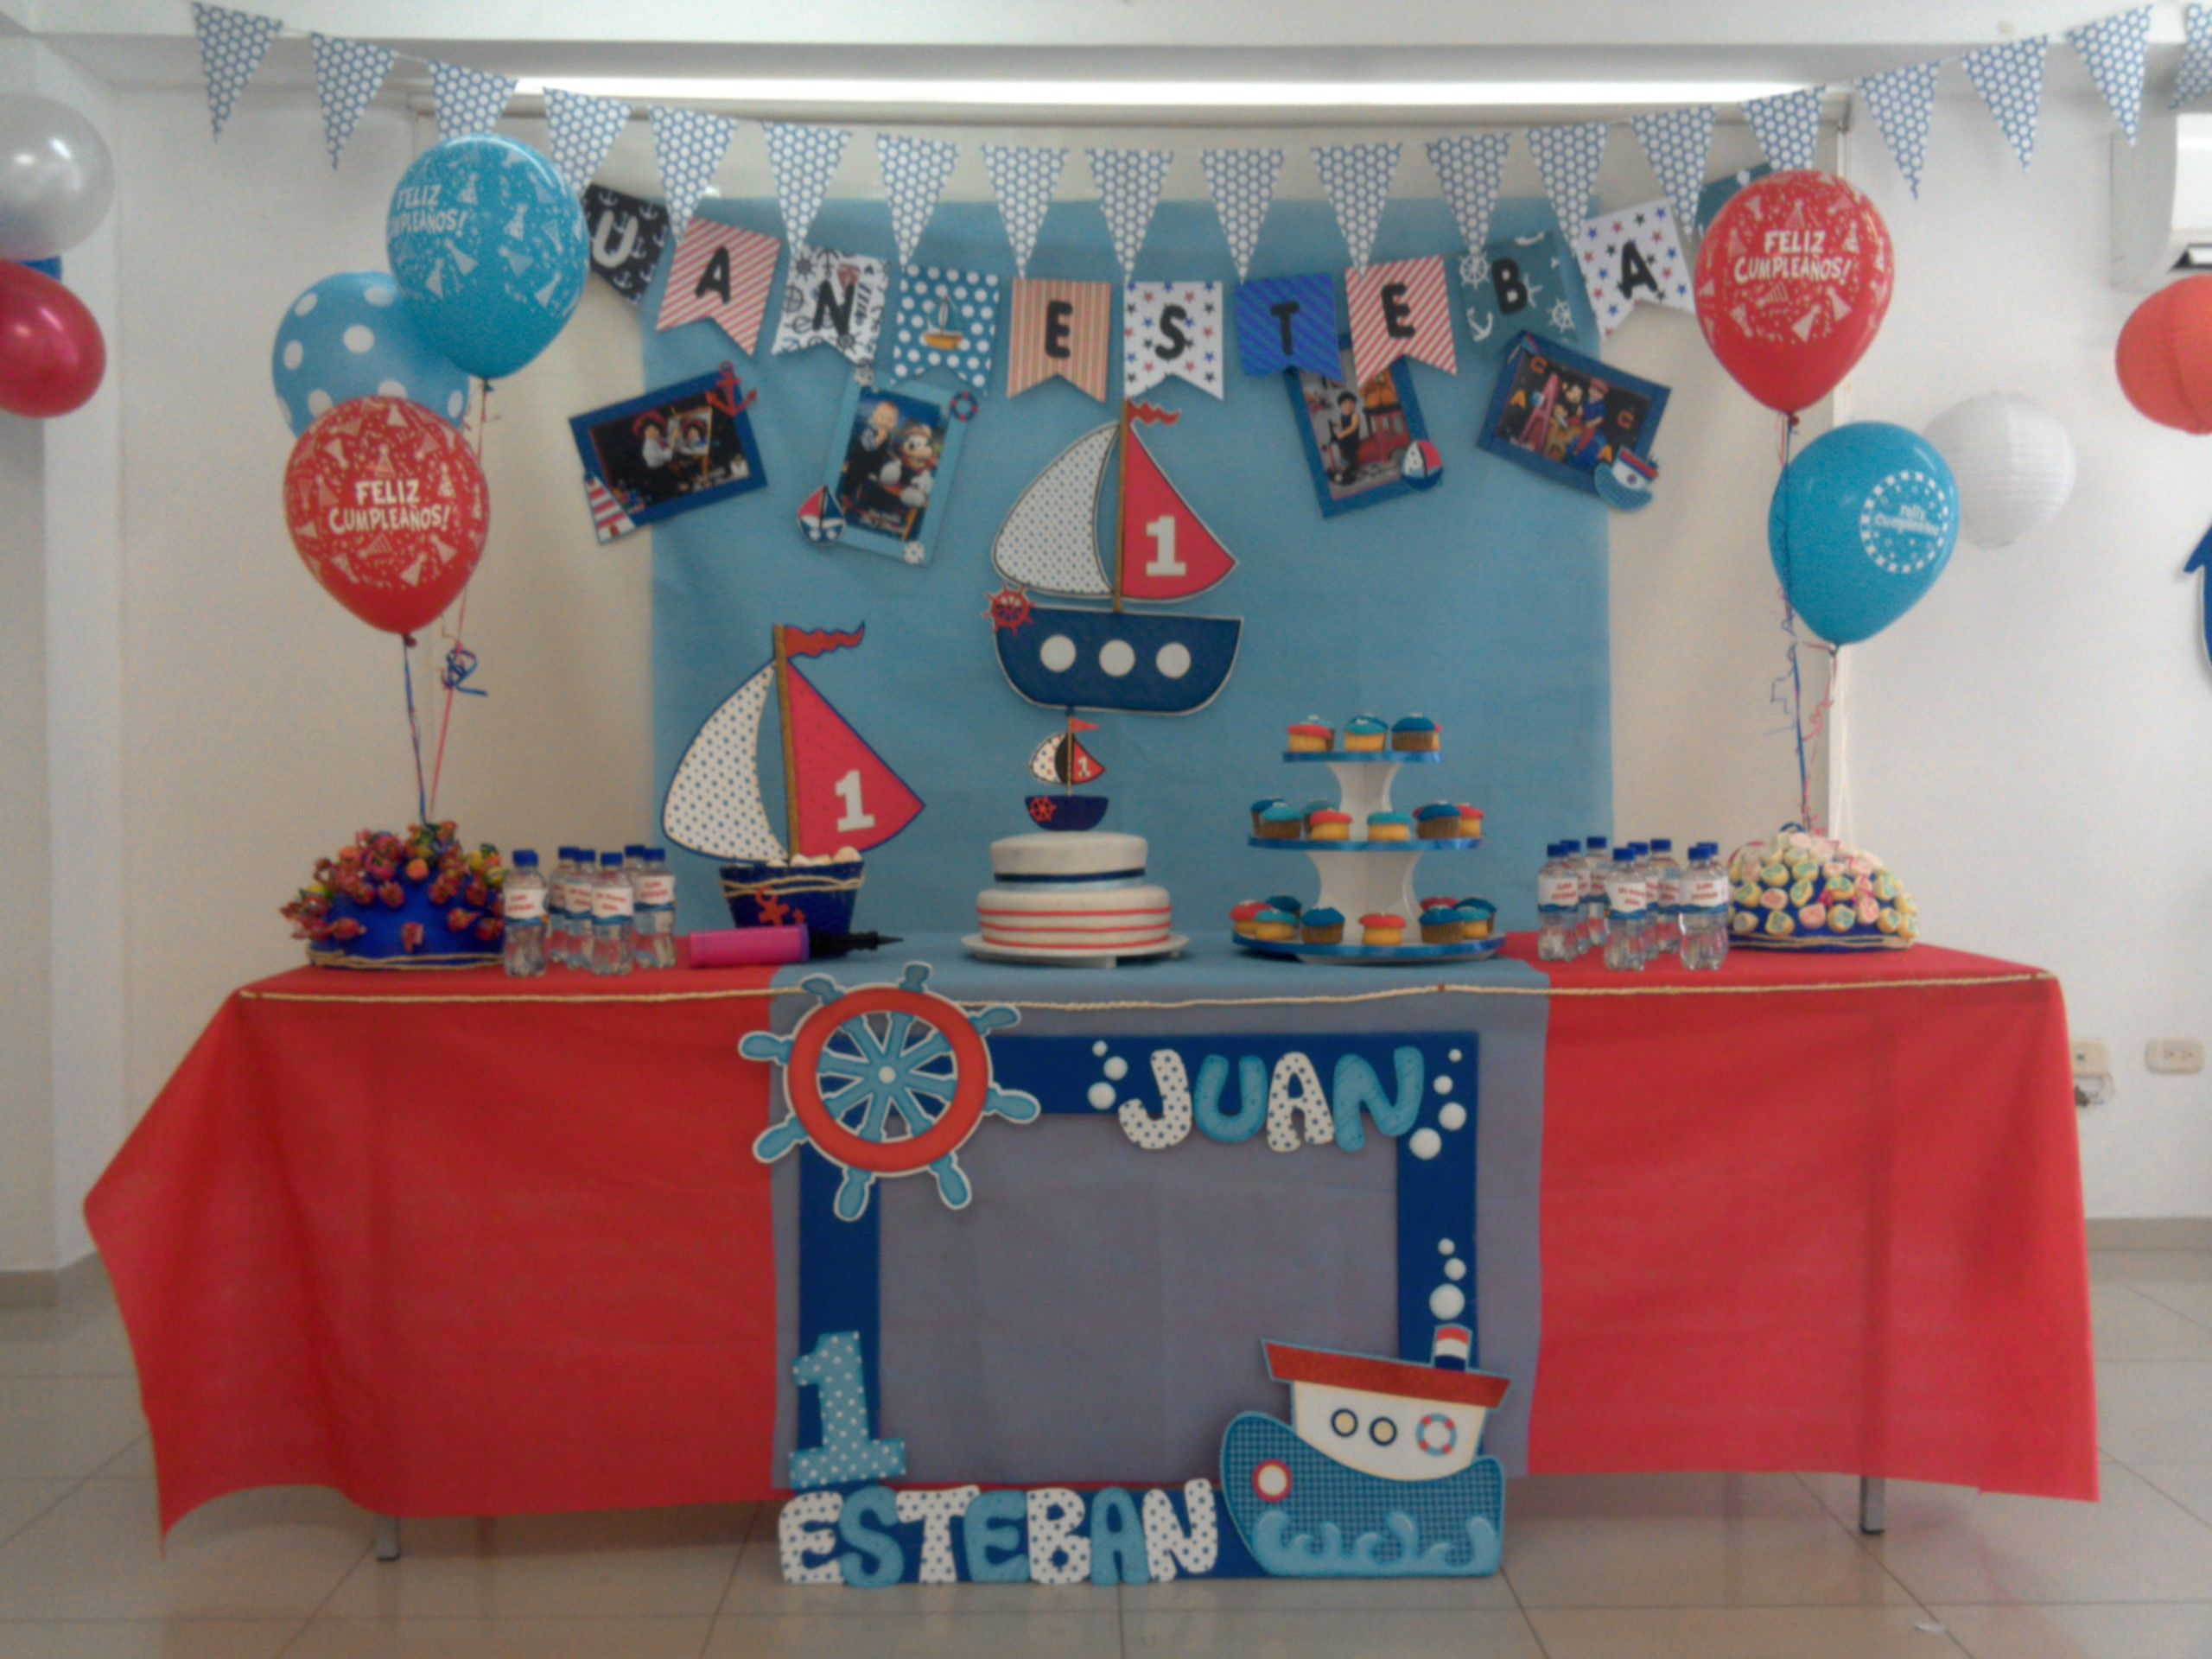 Fiesta de marinero decoraci n pinterest fiesta de for Decoracion nautica infantil